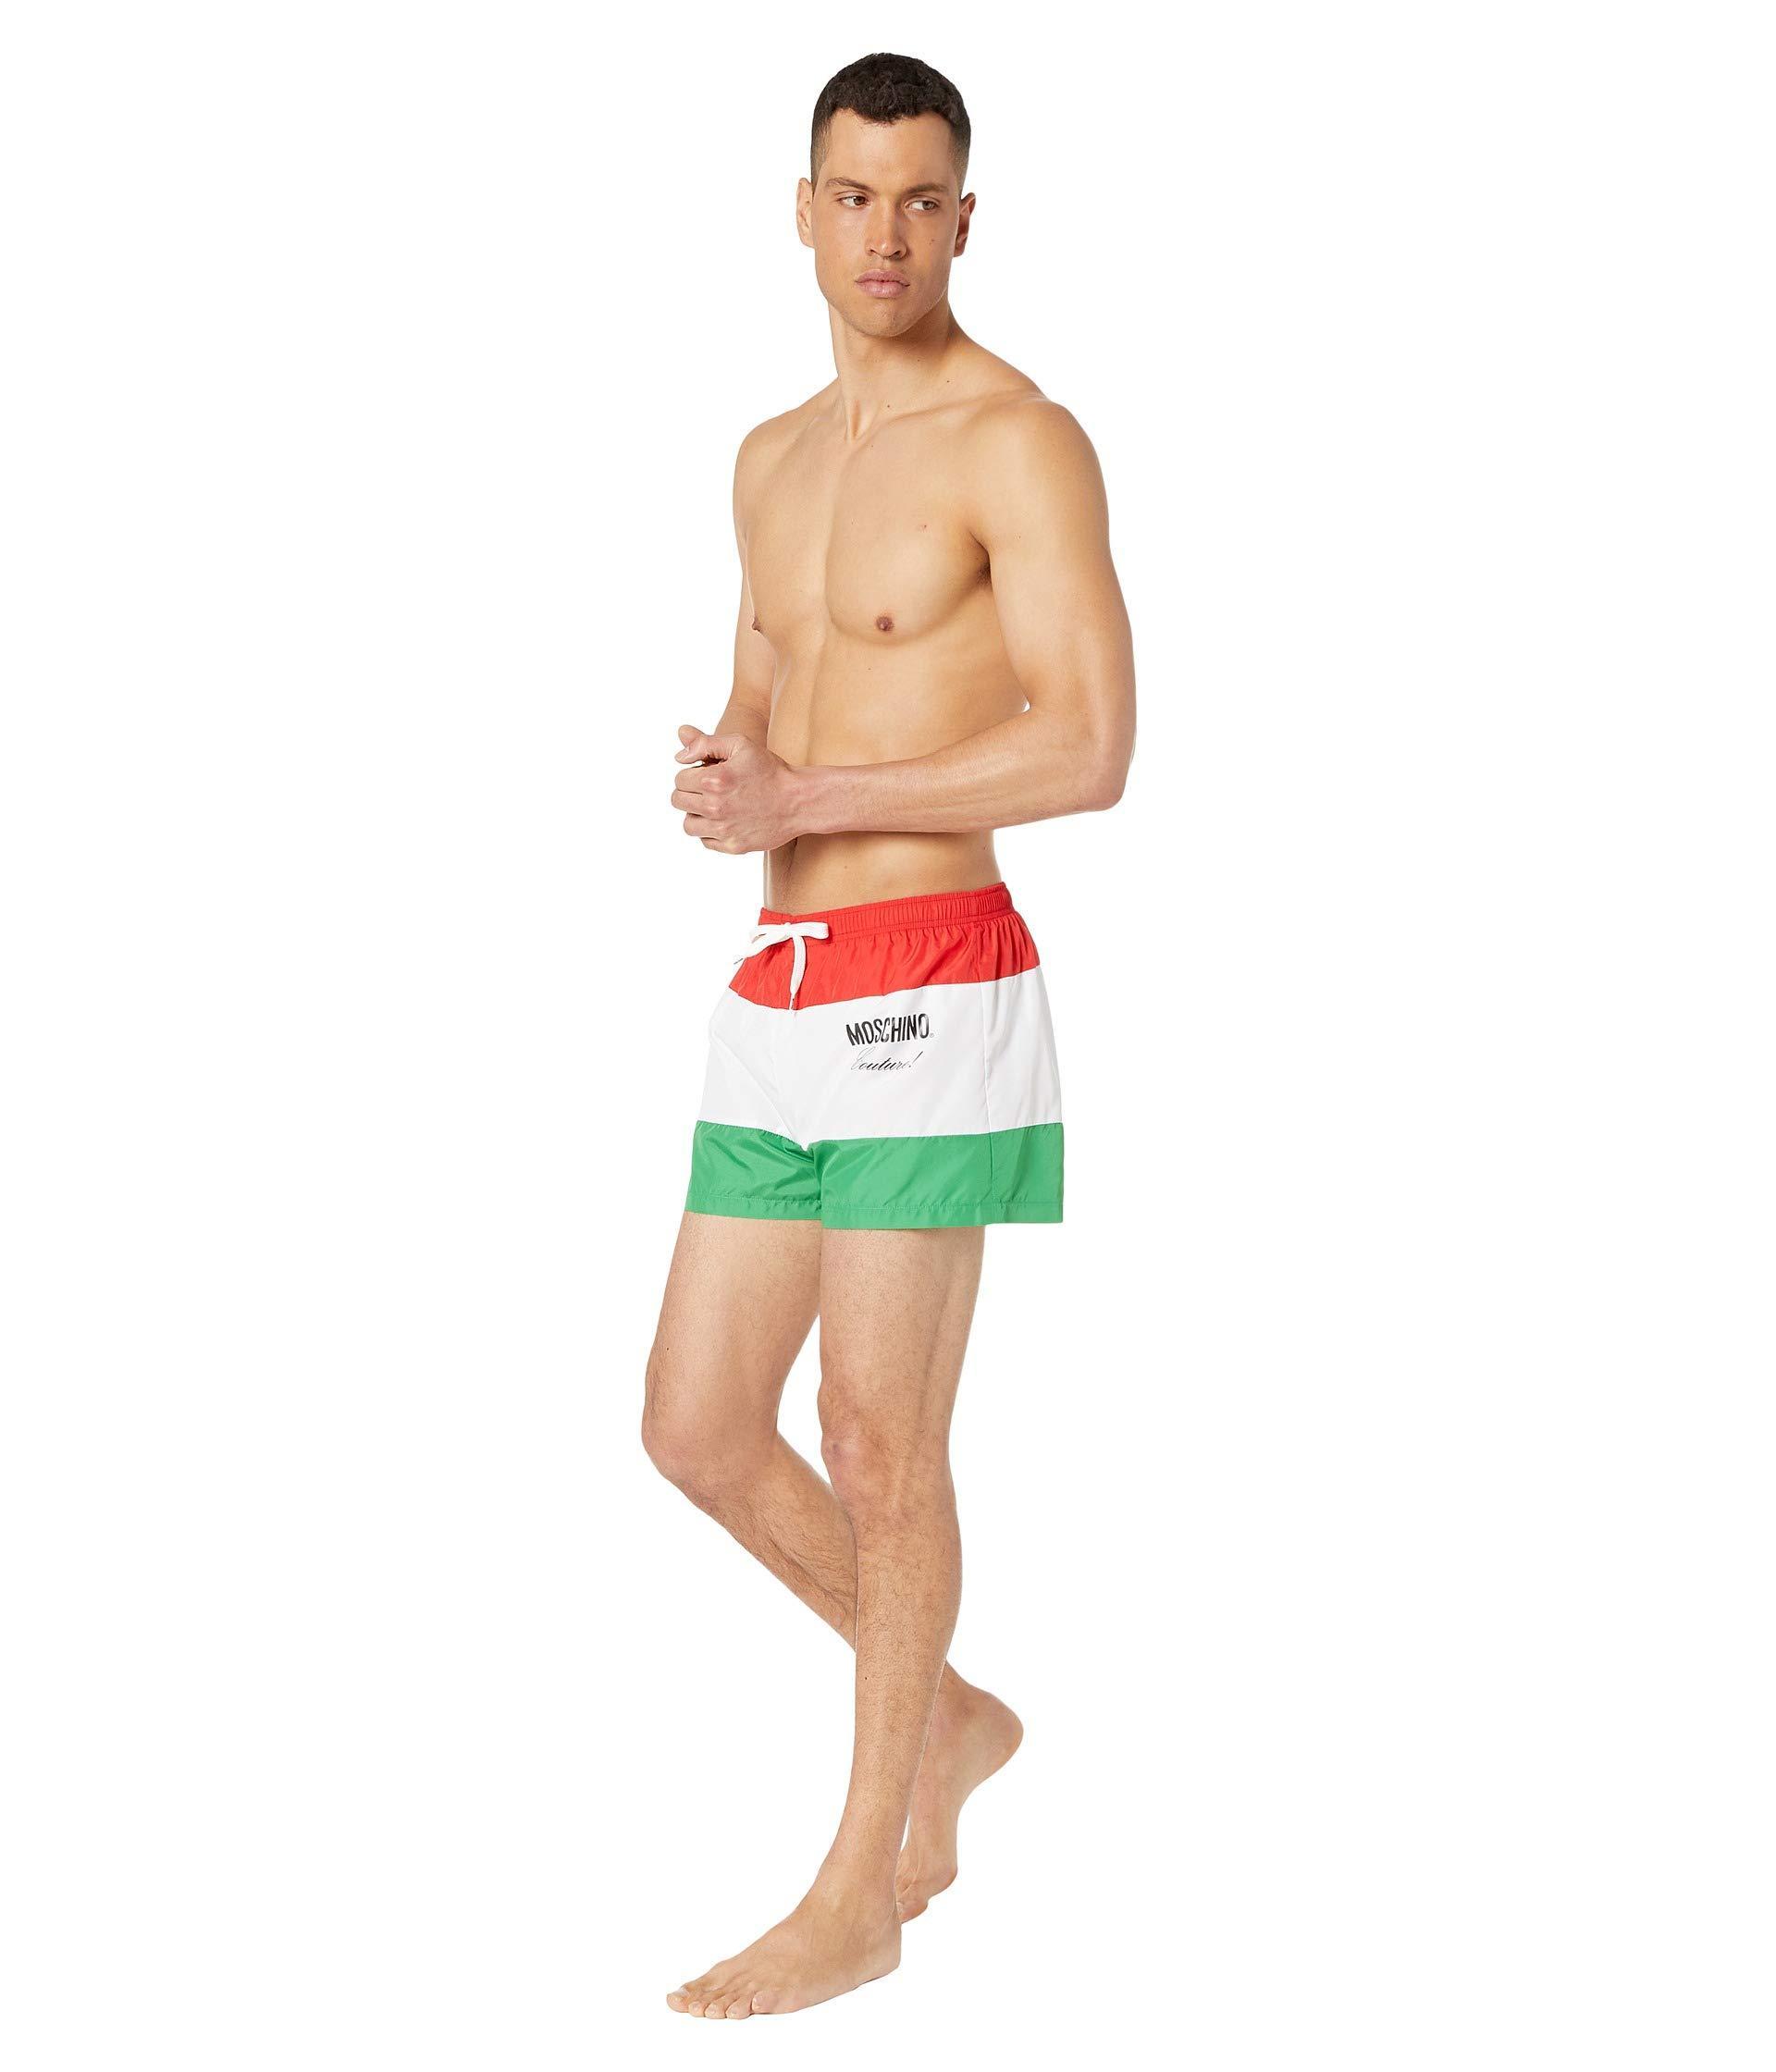 602a272d22 Moschino Italia Couture! Shorts (unique Colorway) Men's Swimwear for ...